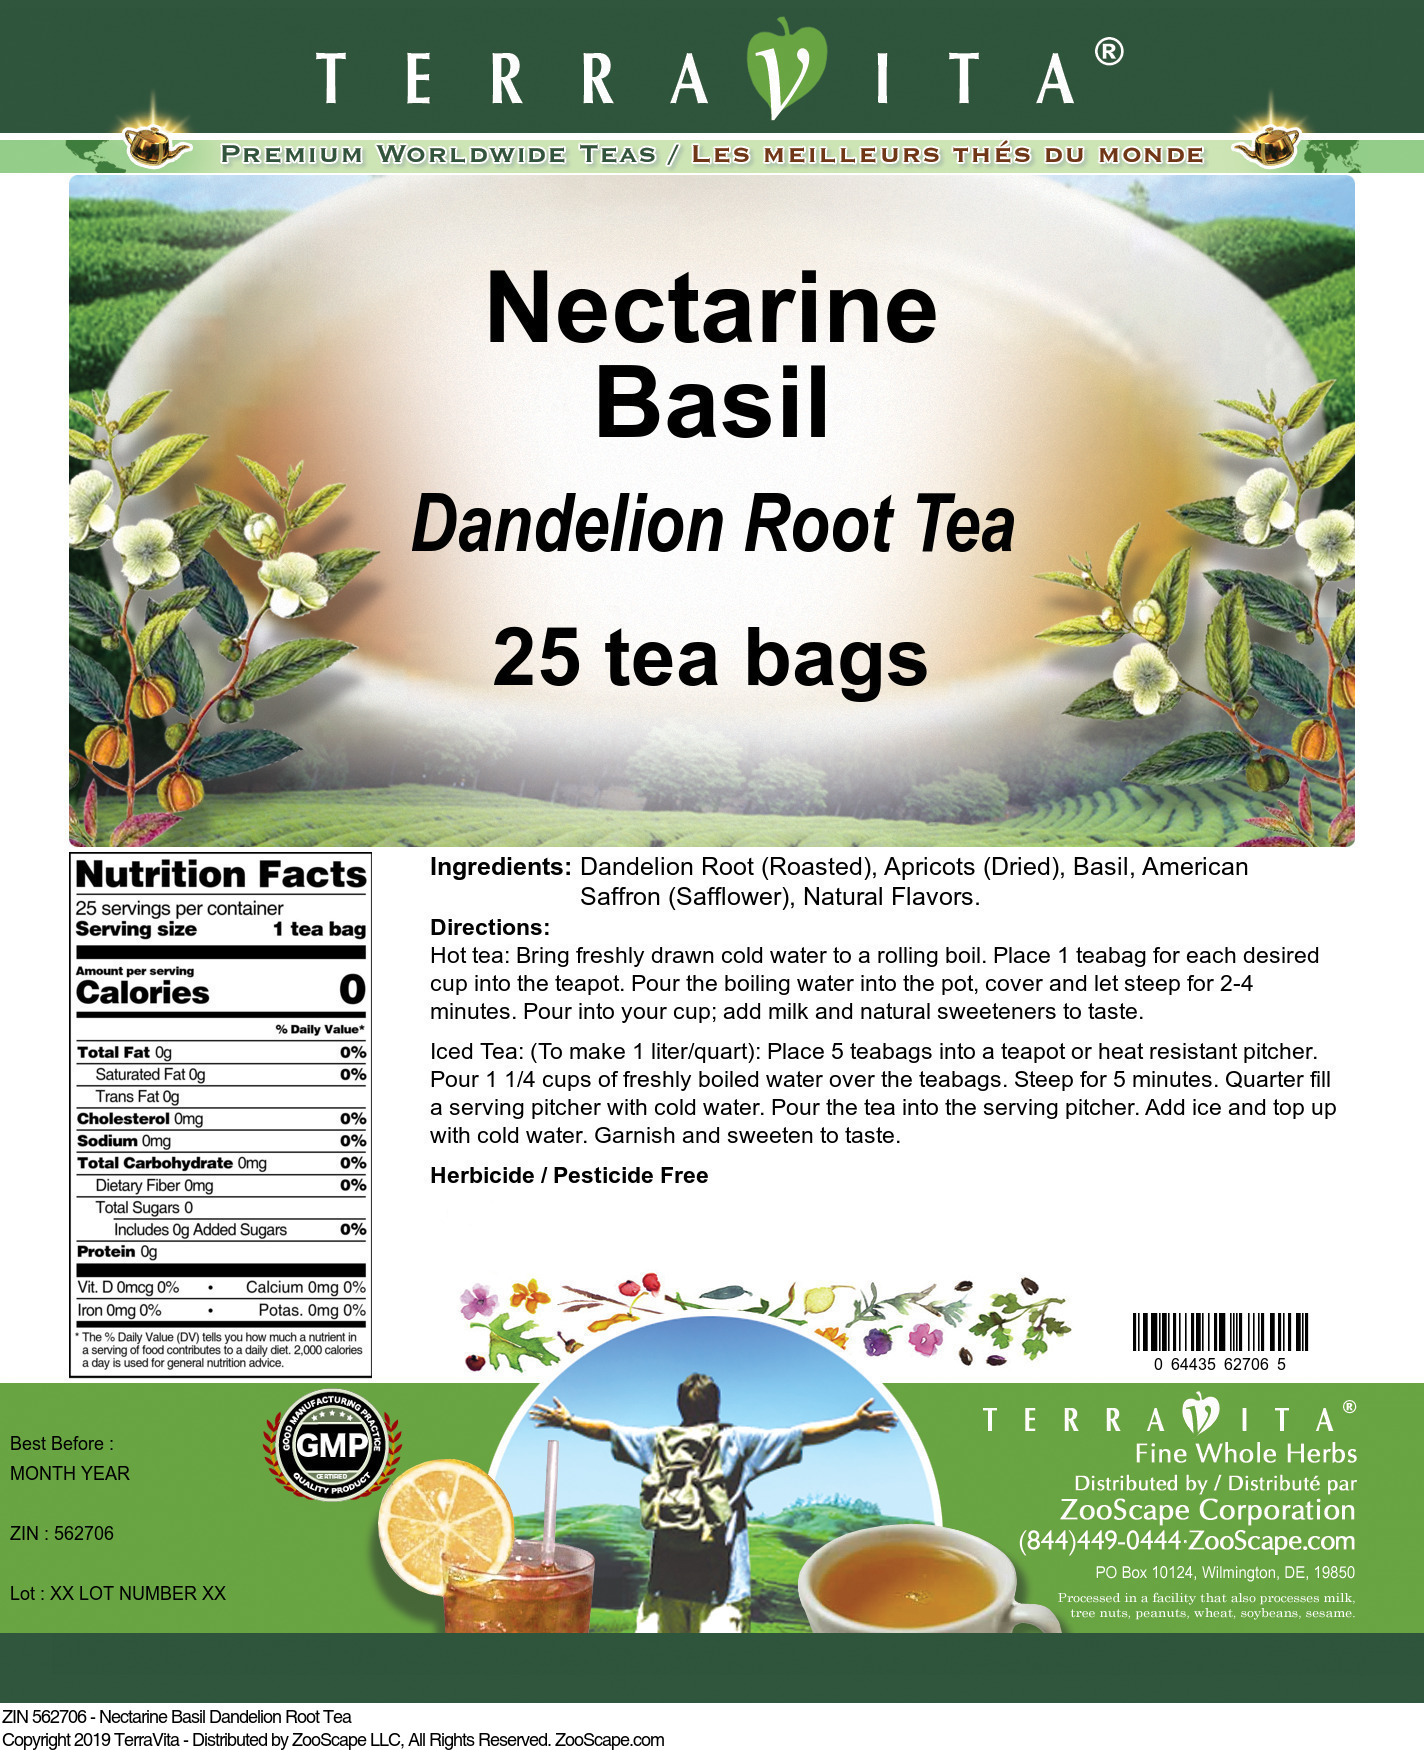 Nectarine Basil Dandelion Root